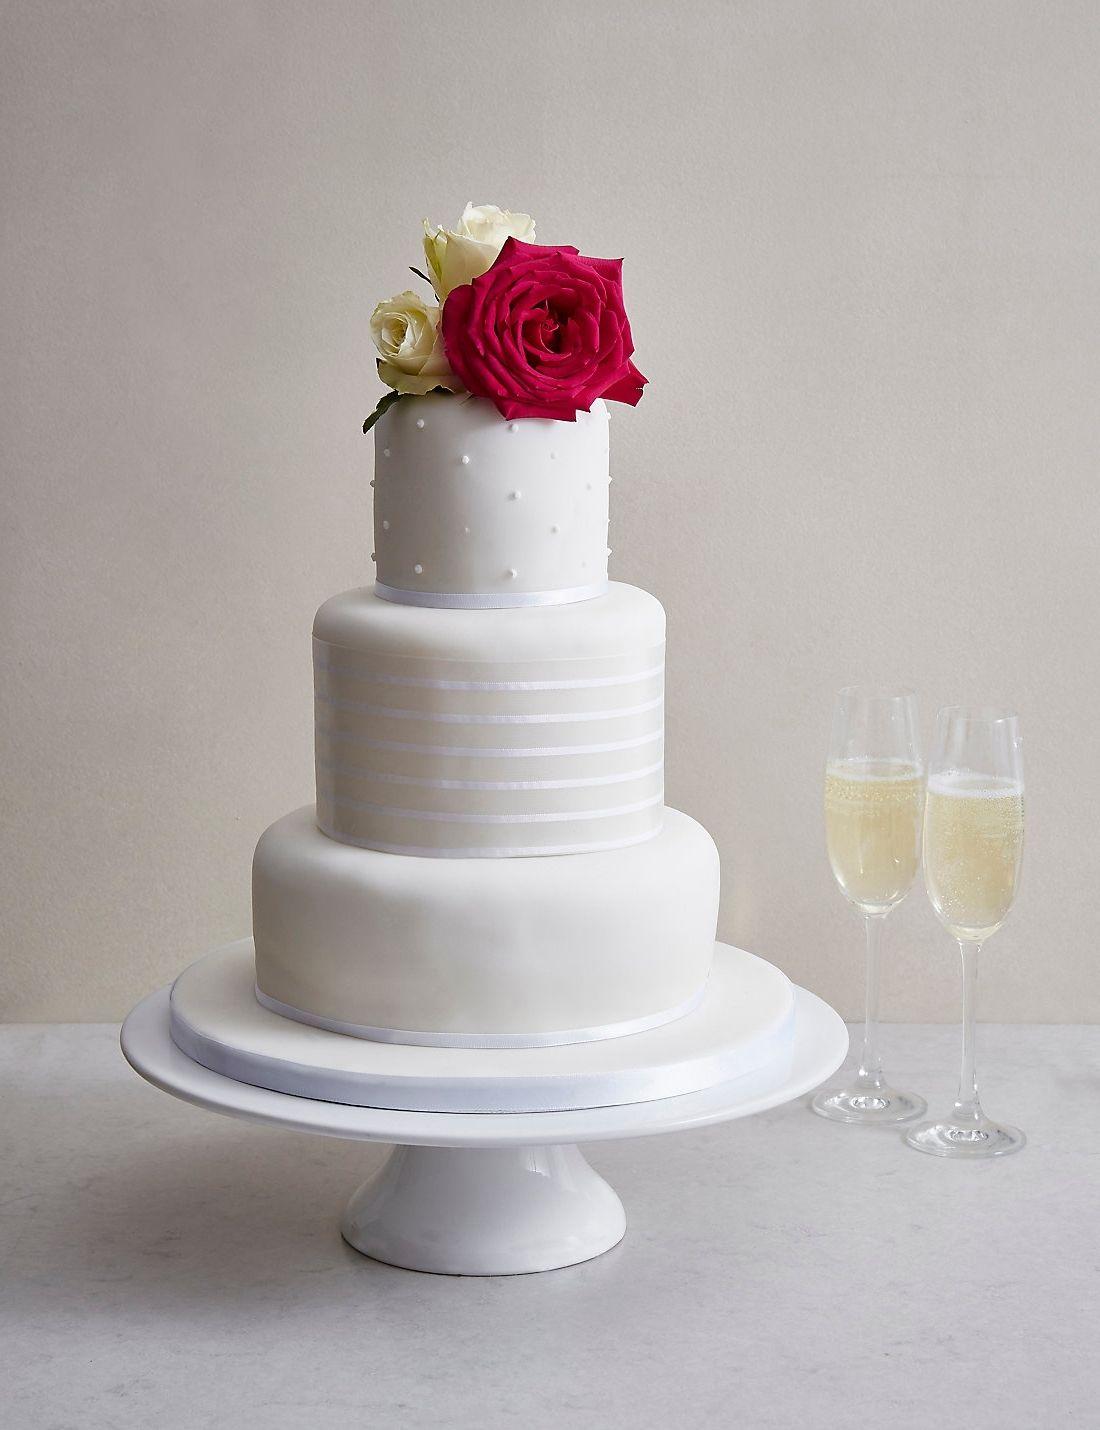 M&S Wedding Cake Brochure   Wedding Dress   Pinterest   Brochures ...